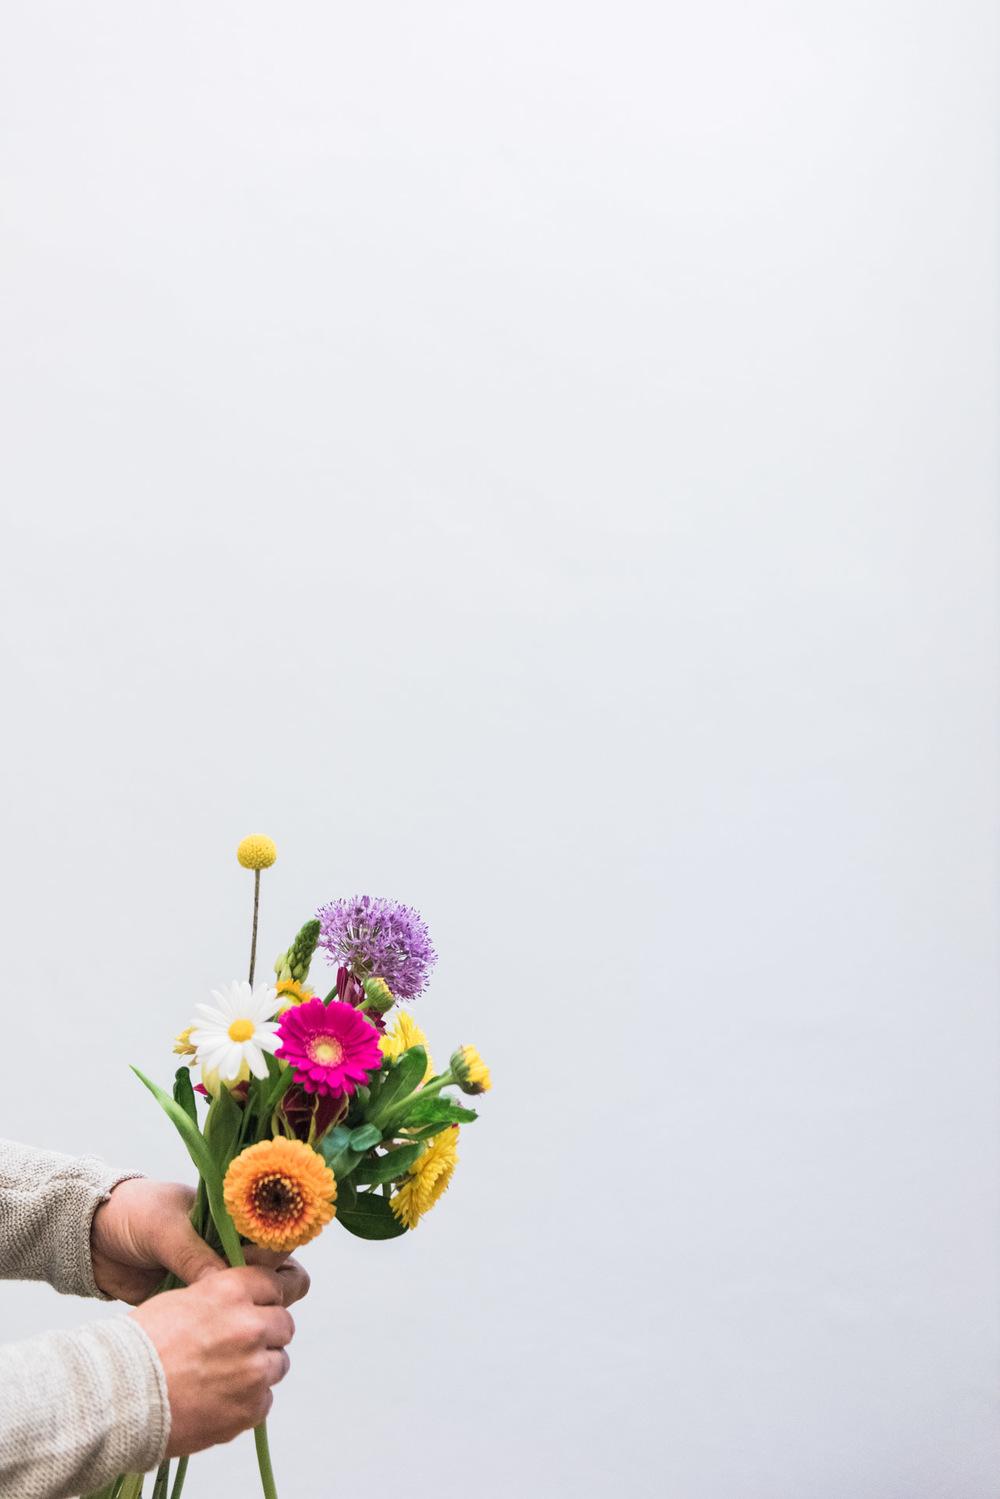 bloomon-passagen-wearecitykoeln-pramudiya-10.jpg